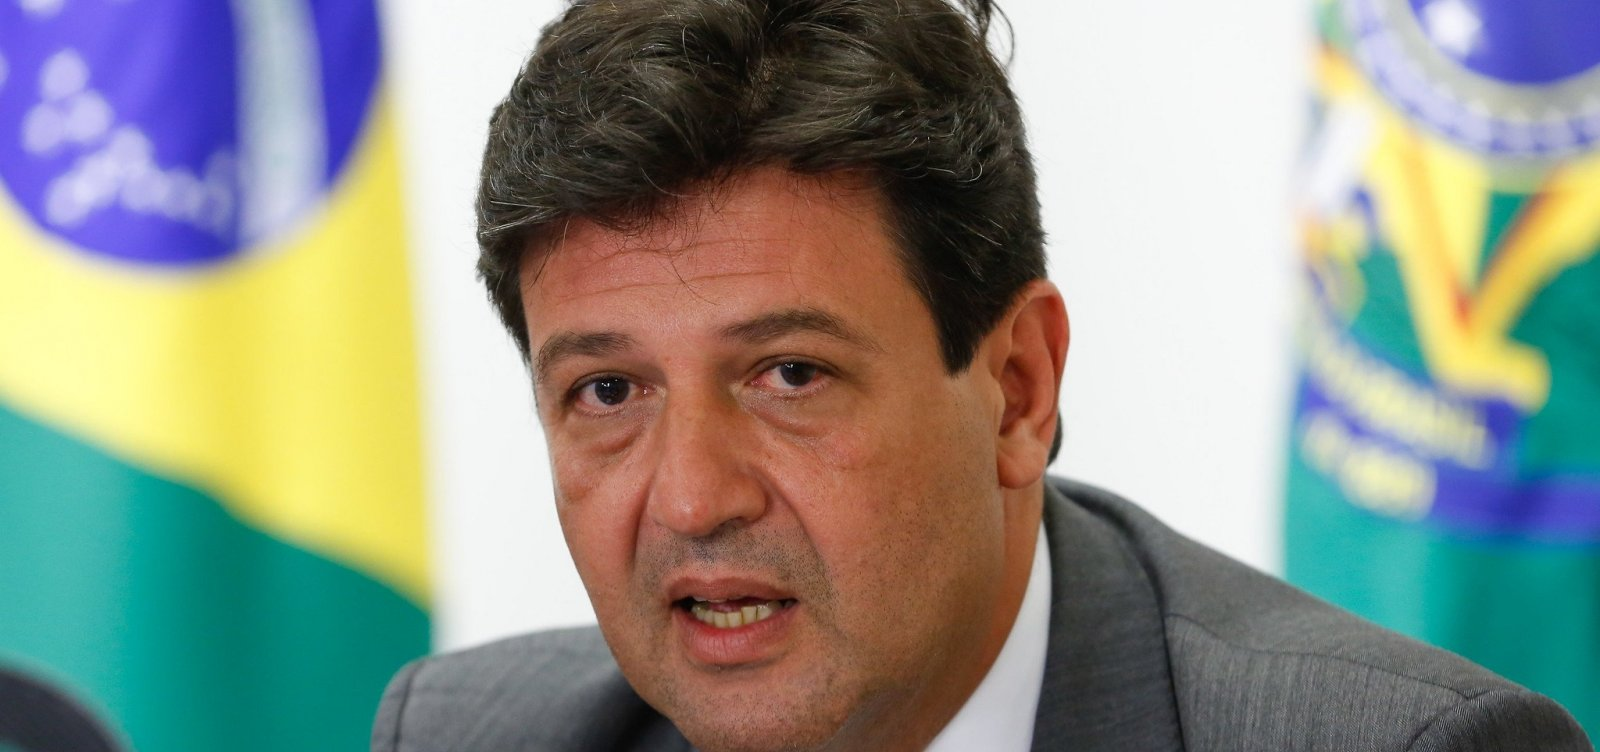 [Após DEM se aproximar de Bolsonaro, Mandetta avalia deixar sigla]